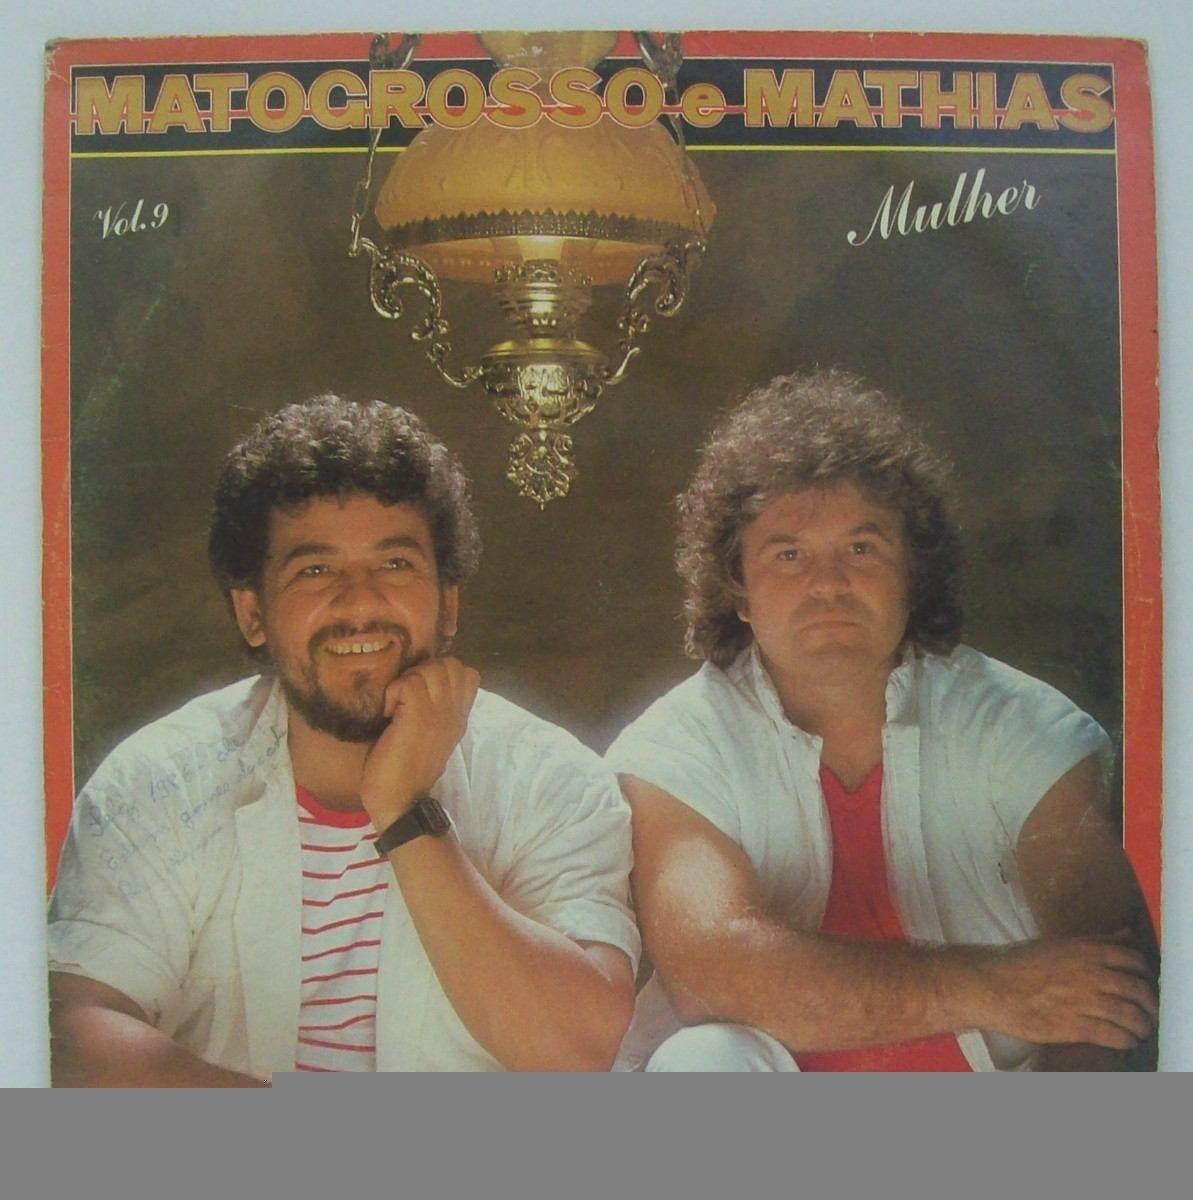 GRATUITO E DOWNLOAD MATOGROSSO DISCOGRAFIA MATHIAS